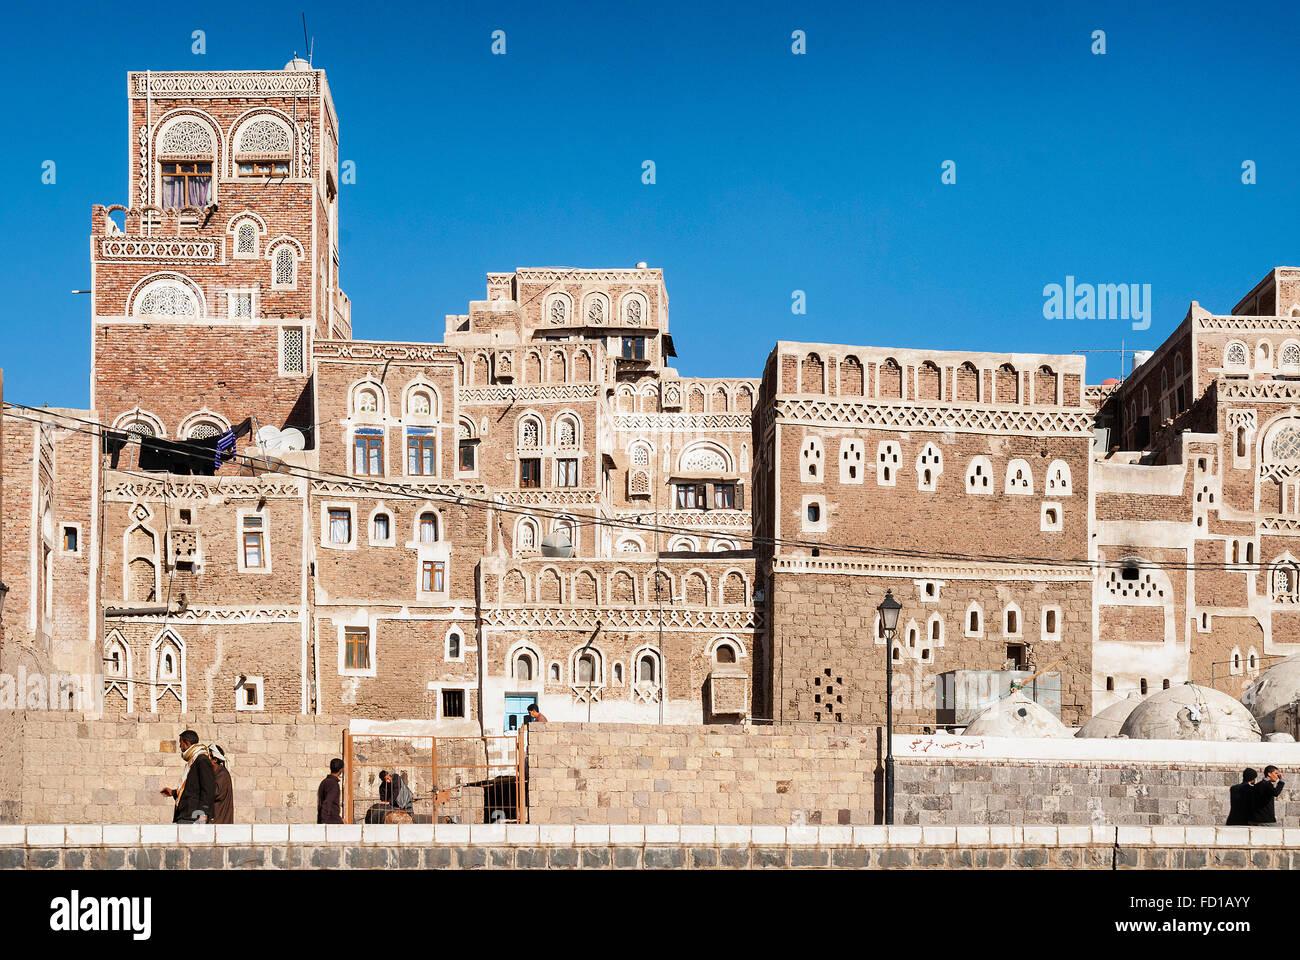 sanaa city old town in yemen - Stock Image